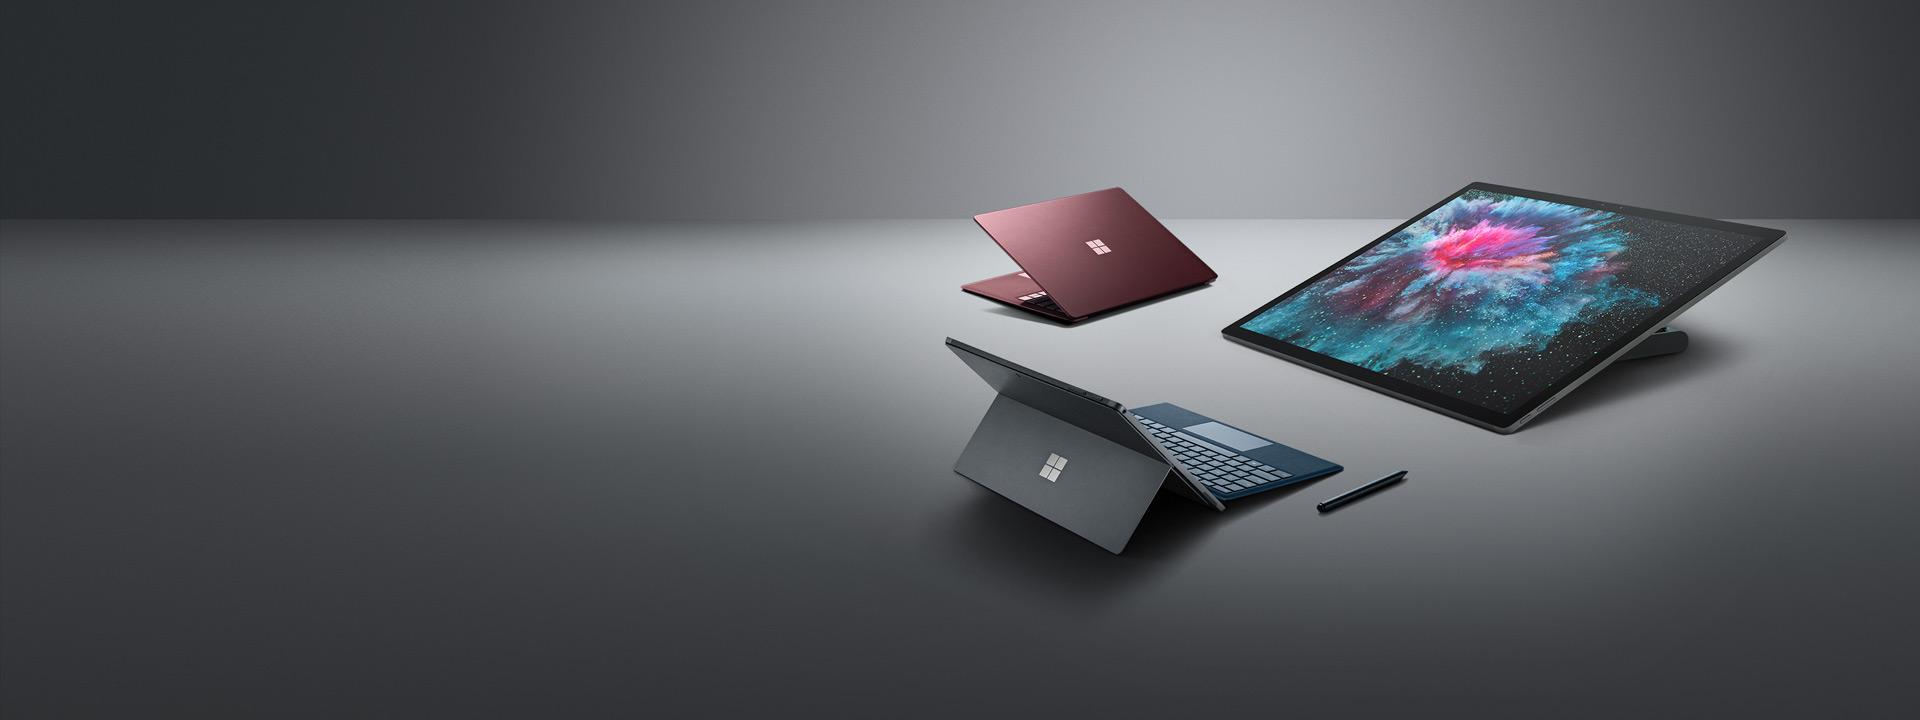 Surface Laptop 2, Surface Pro 6, Surface Go, Surface Studio 2